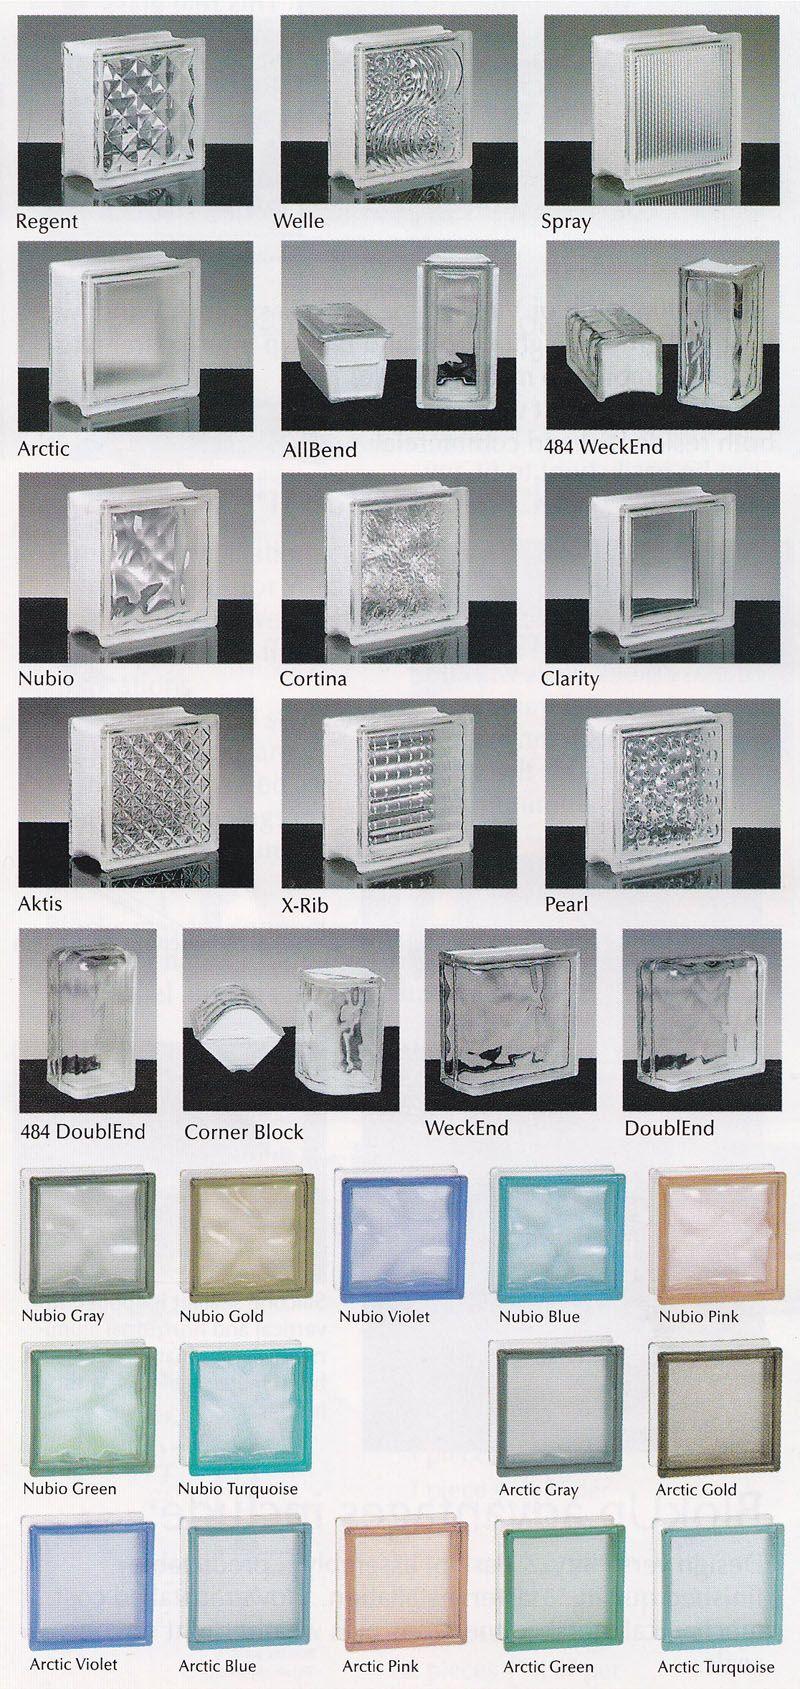 Glass Block Glass Block Masonry Building Material Glass Block Mortar Glass Block Cleaner Ventanas De Bloques De Vidrio Ladrillos De Vidrio Bloques De Vidrio